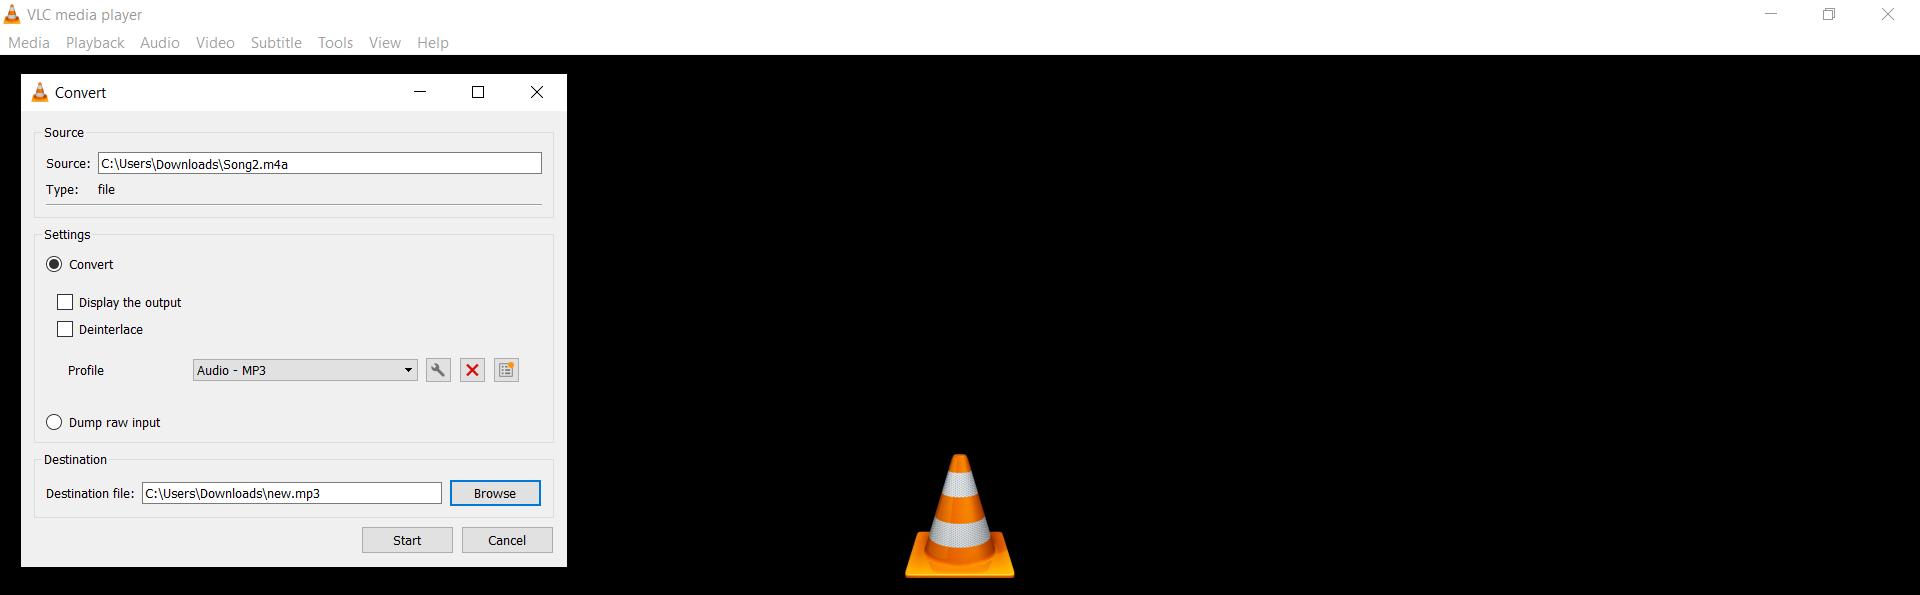 Converting audio files using VLC